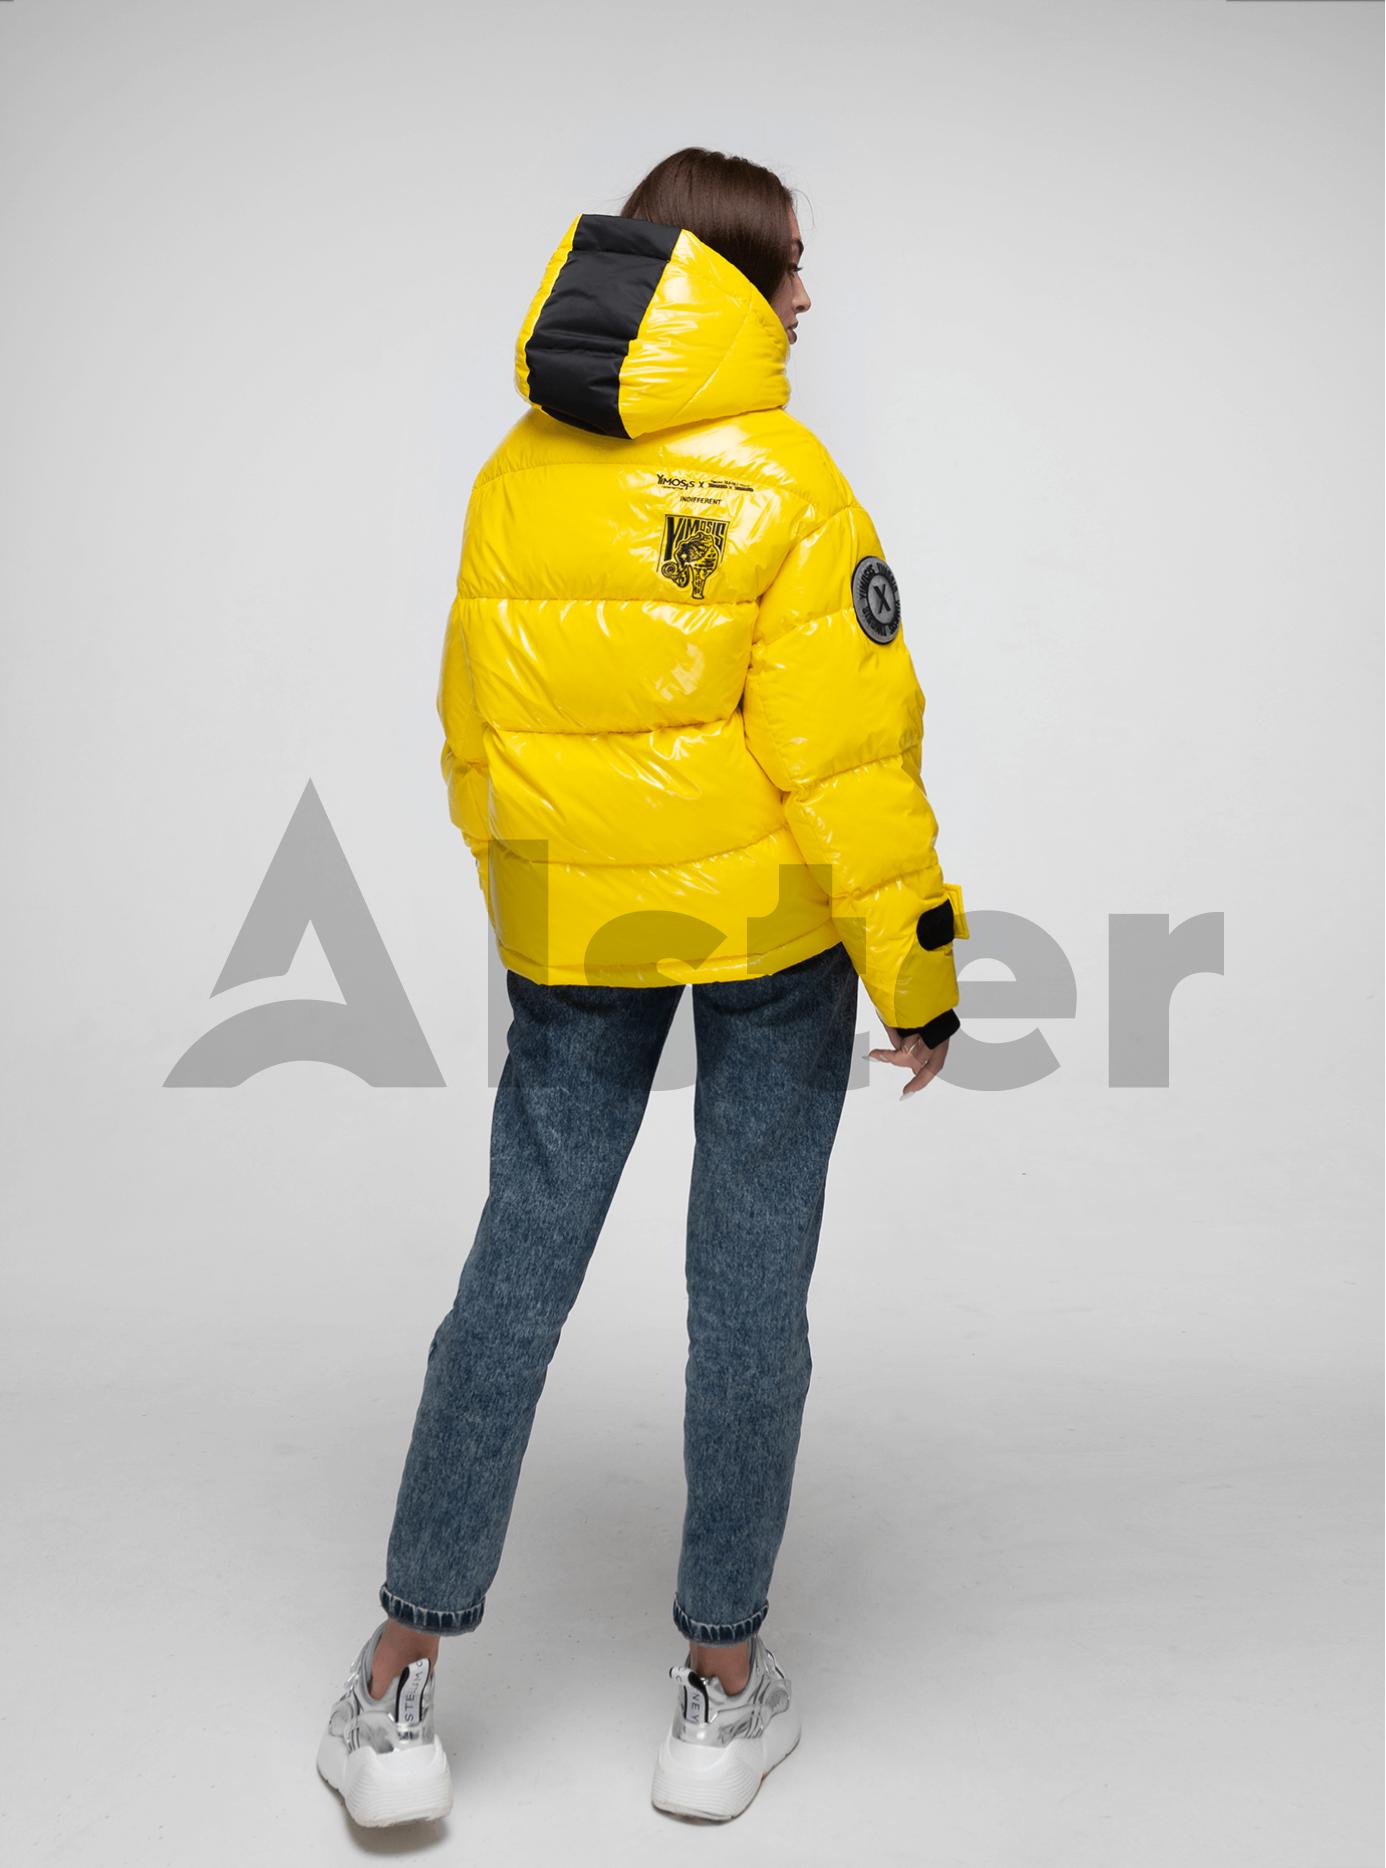 Пуховик зимний короткий Жёлтый L (02-Y191114): фото - Alster.ua